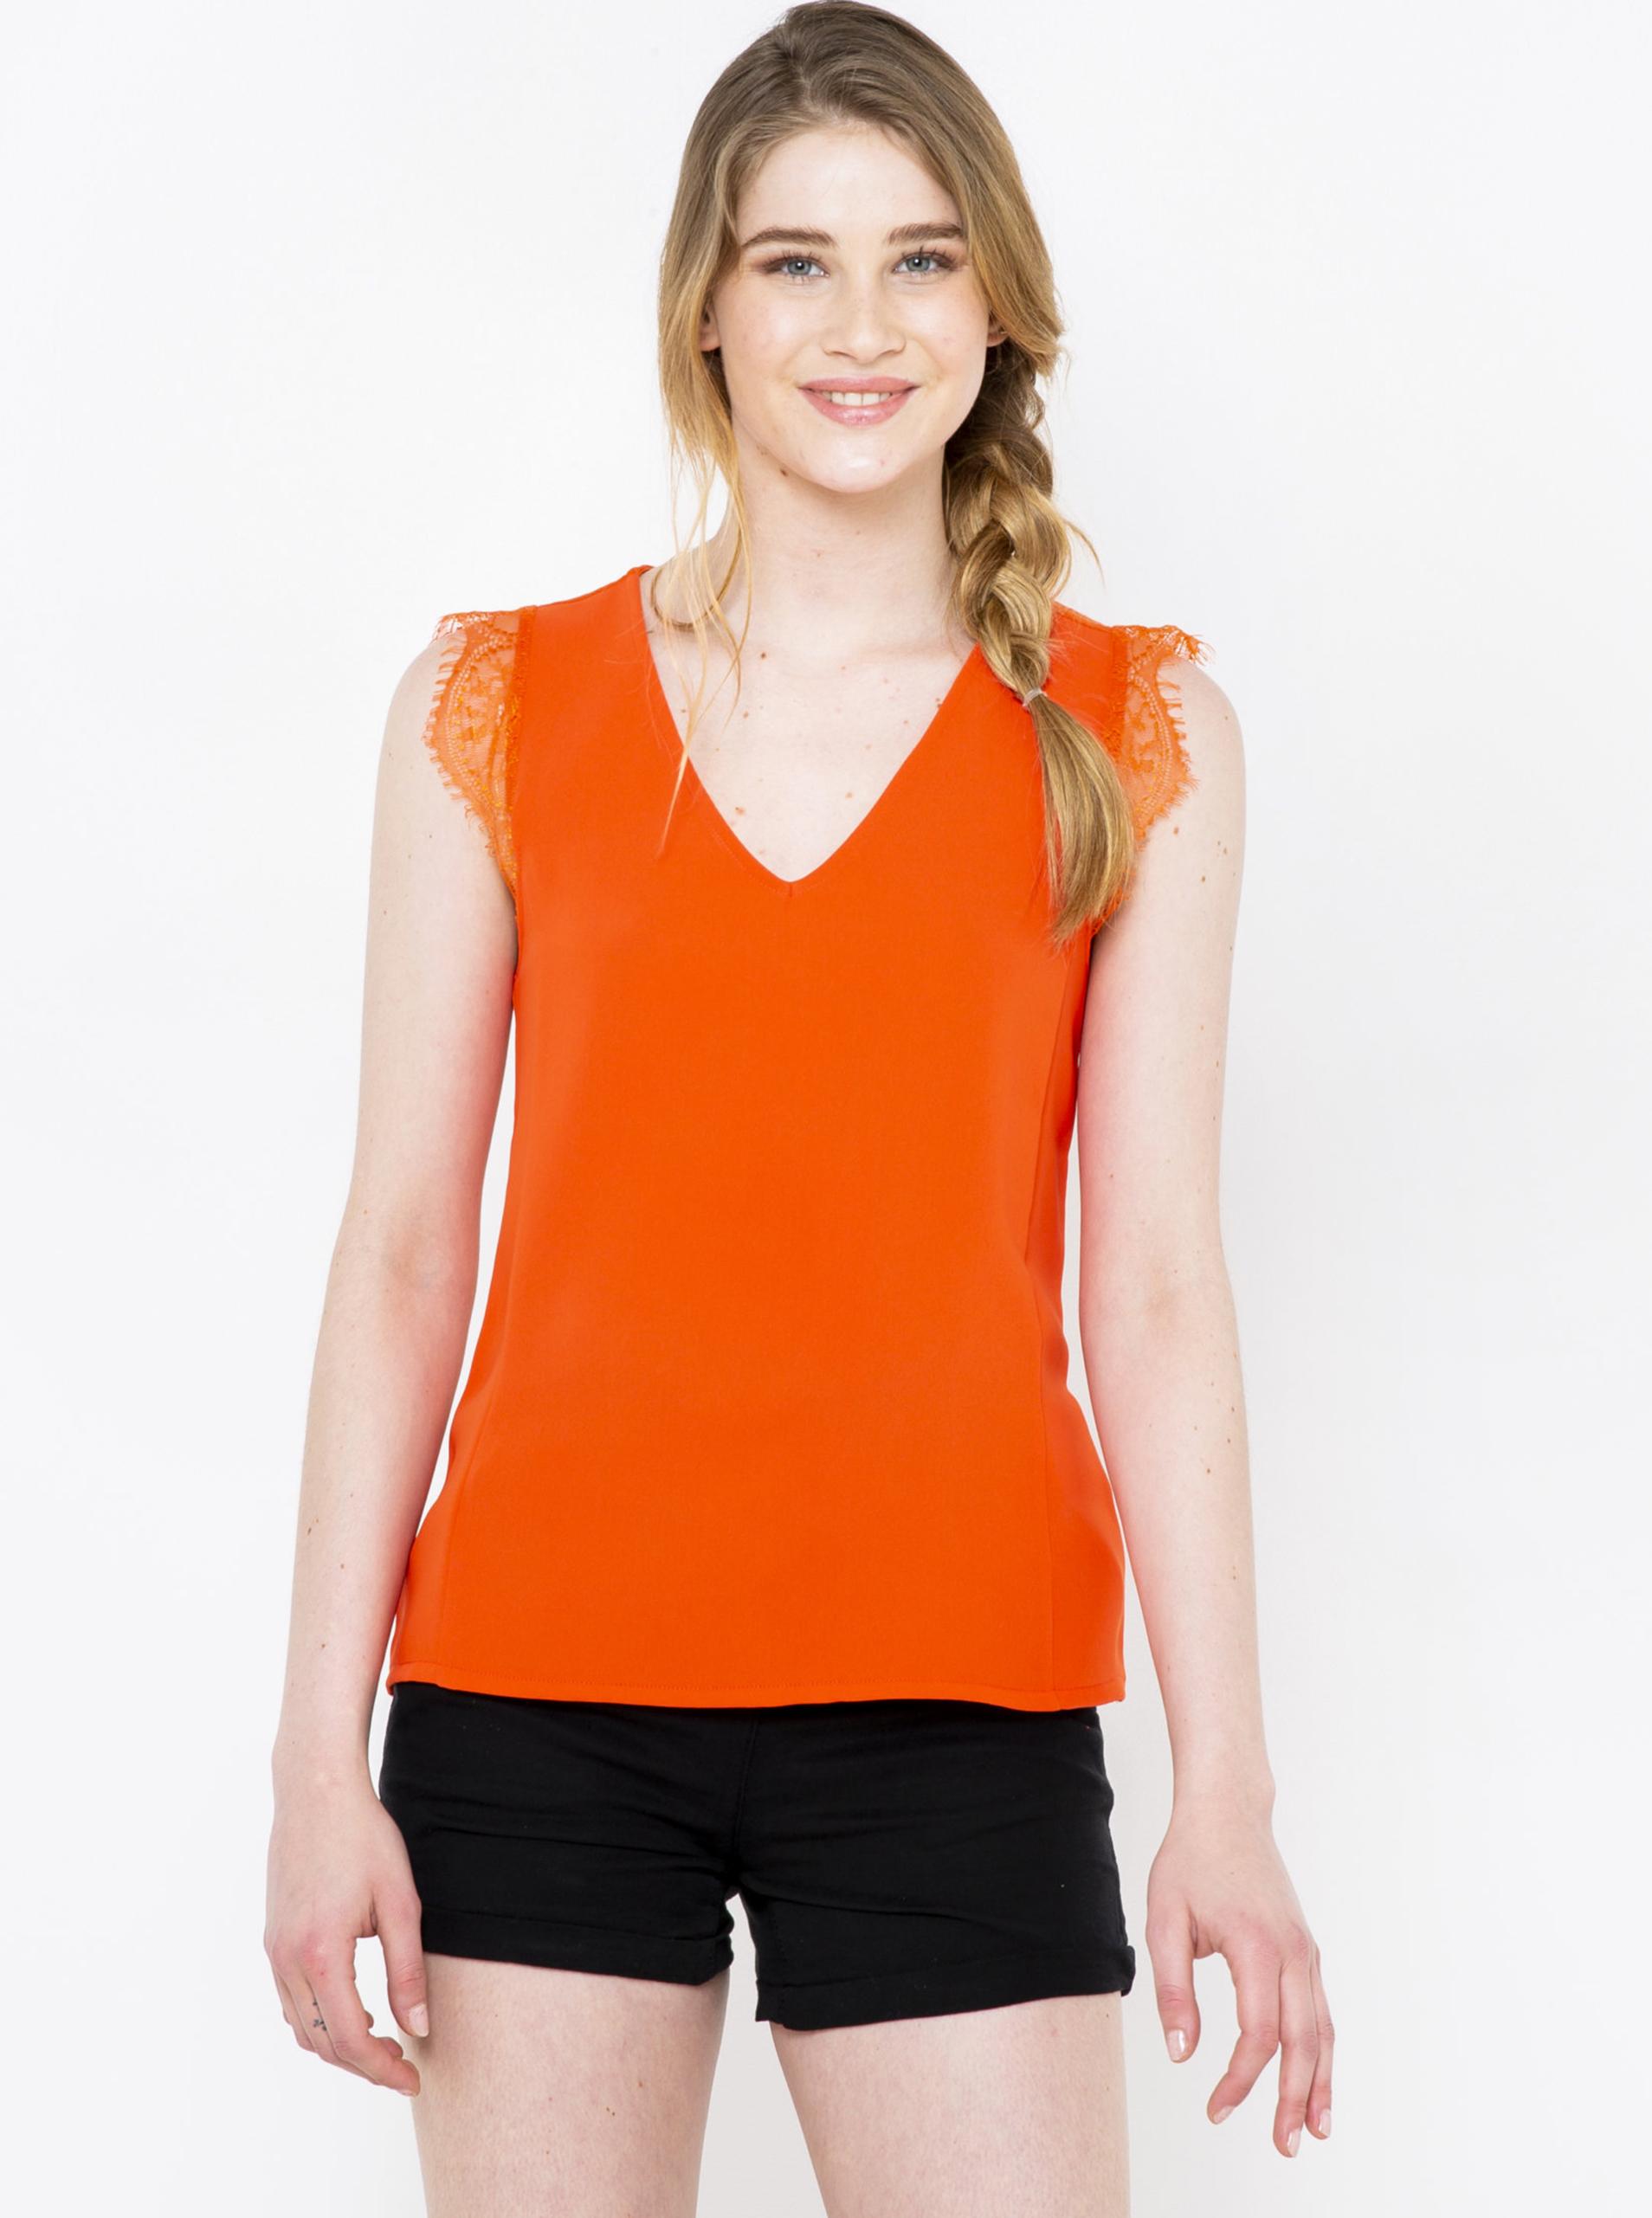 CAMAIEU orange women´s top with lace